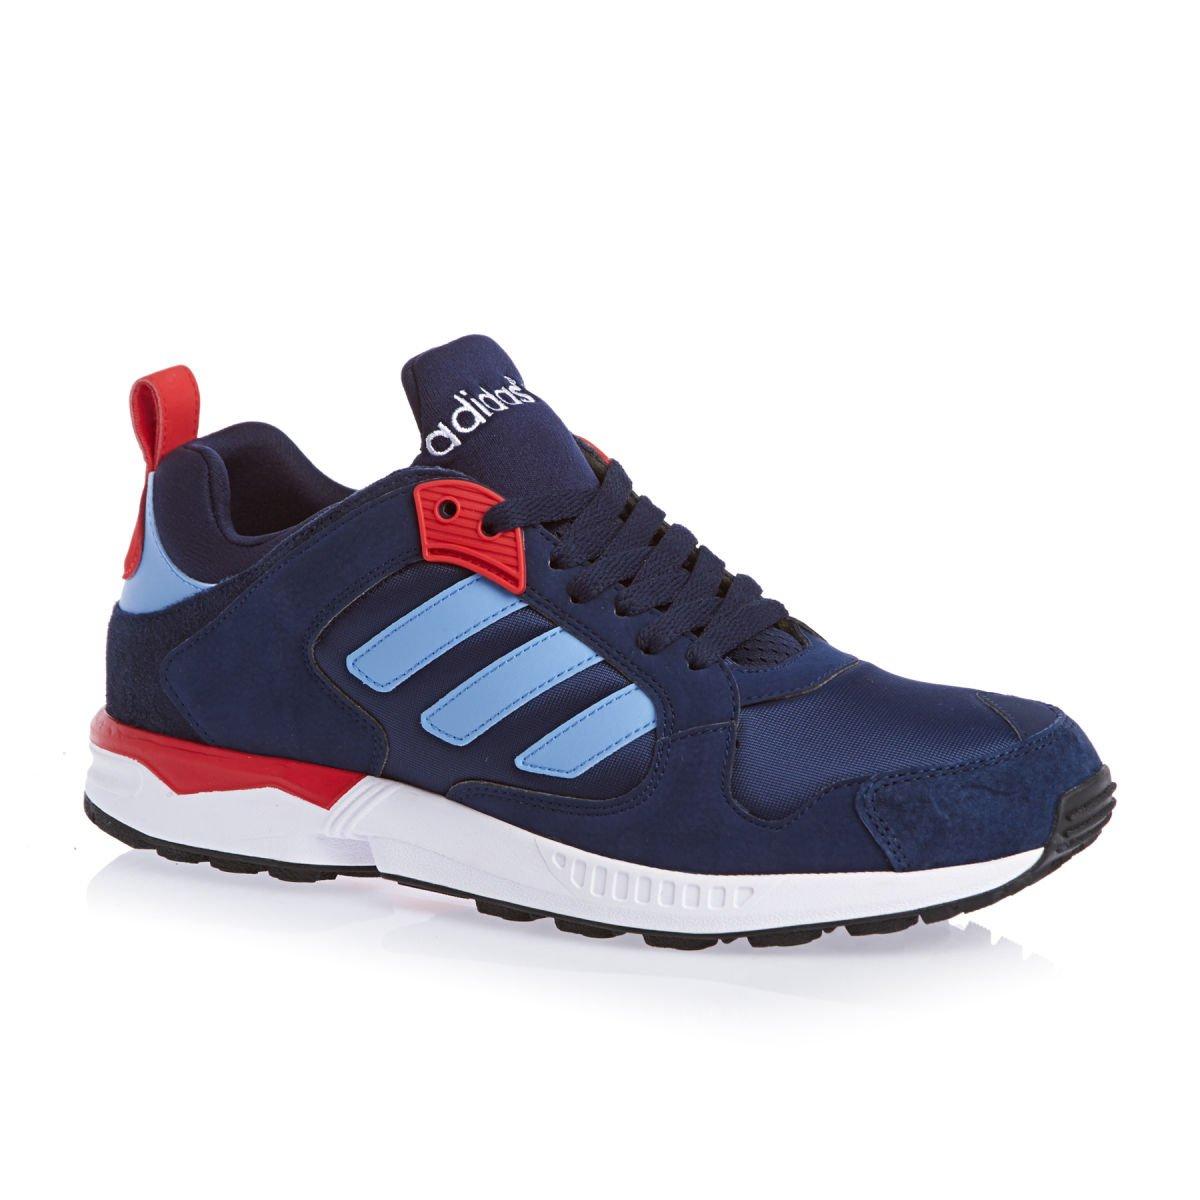 new style a2ef8 81a8c adidas originals Shoes - adidas originals Zx 50...: Amazon ...